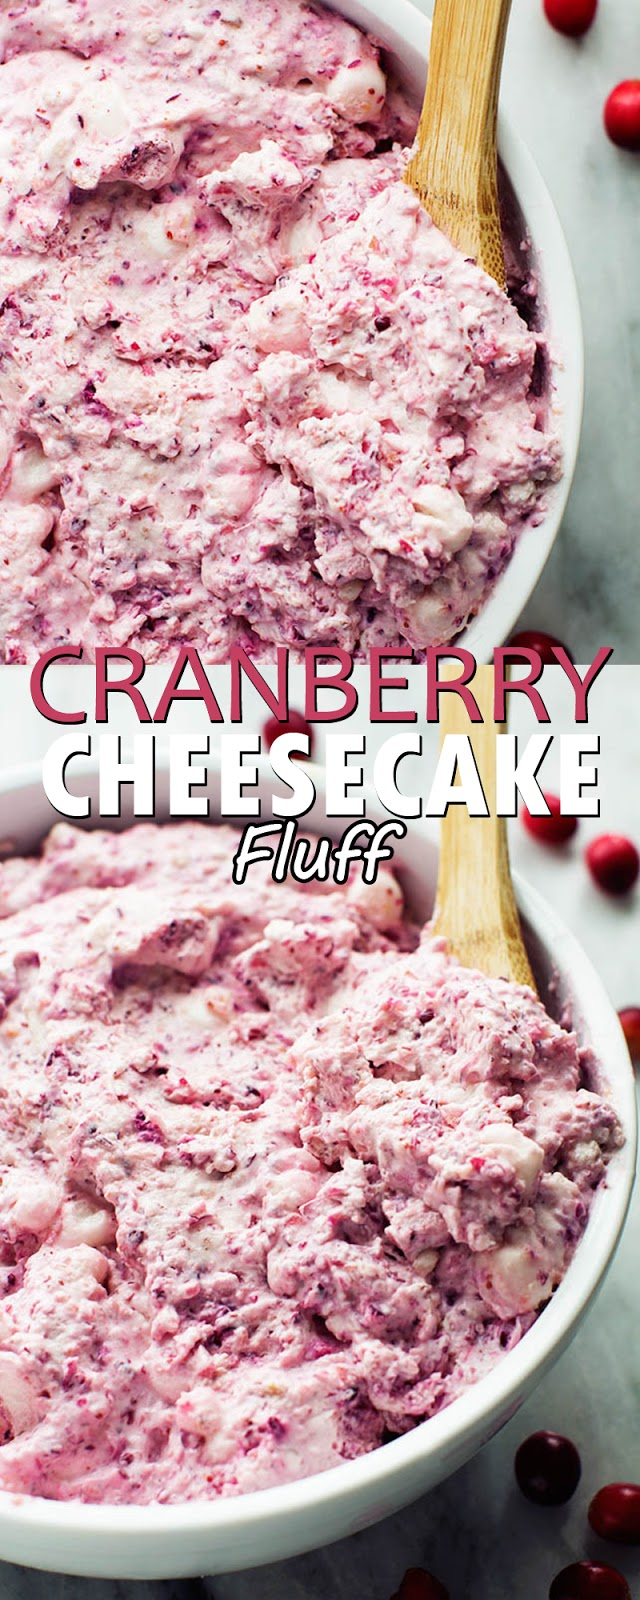 CRANBERRY CHEESECAKE FLUFF